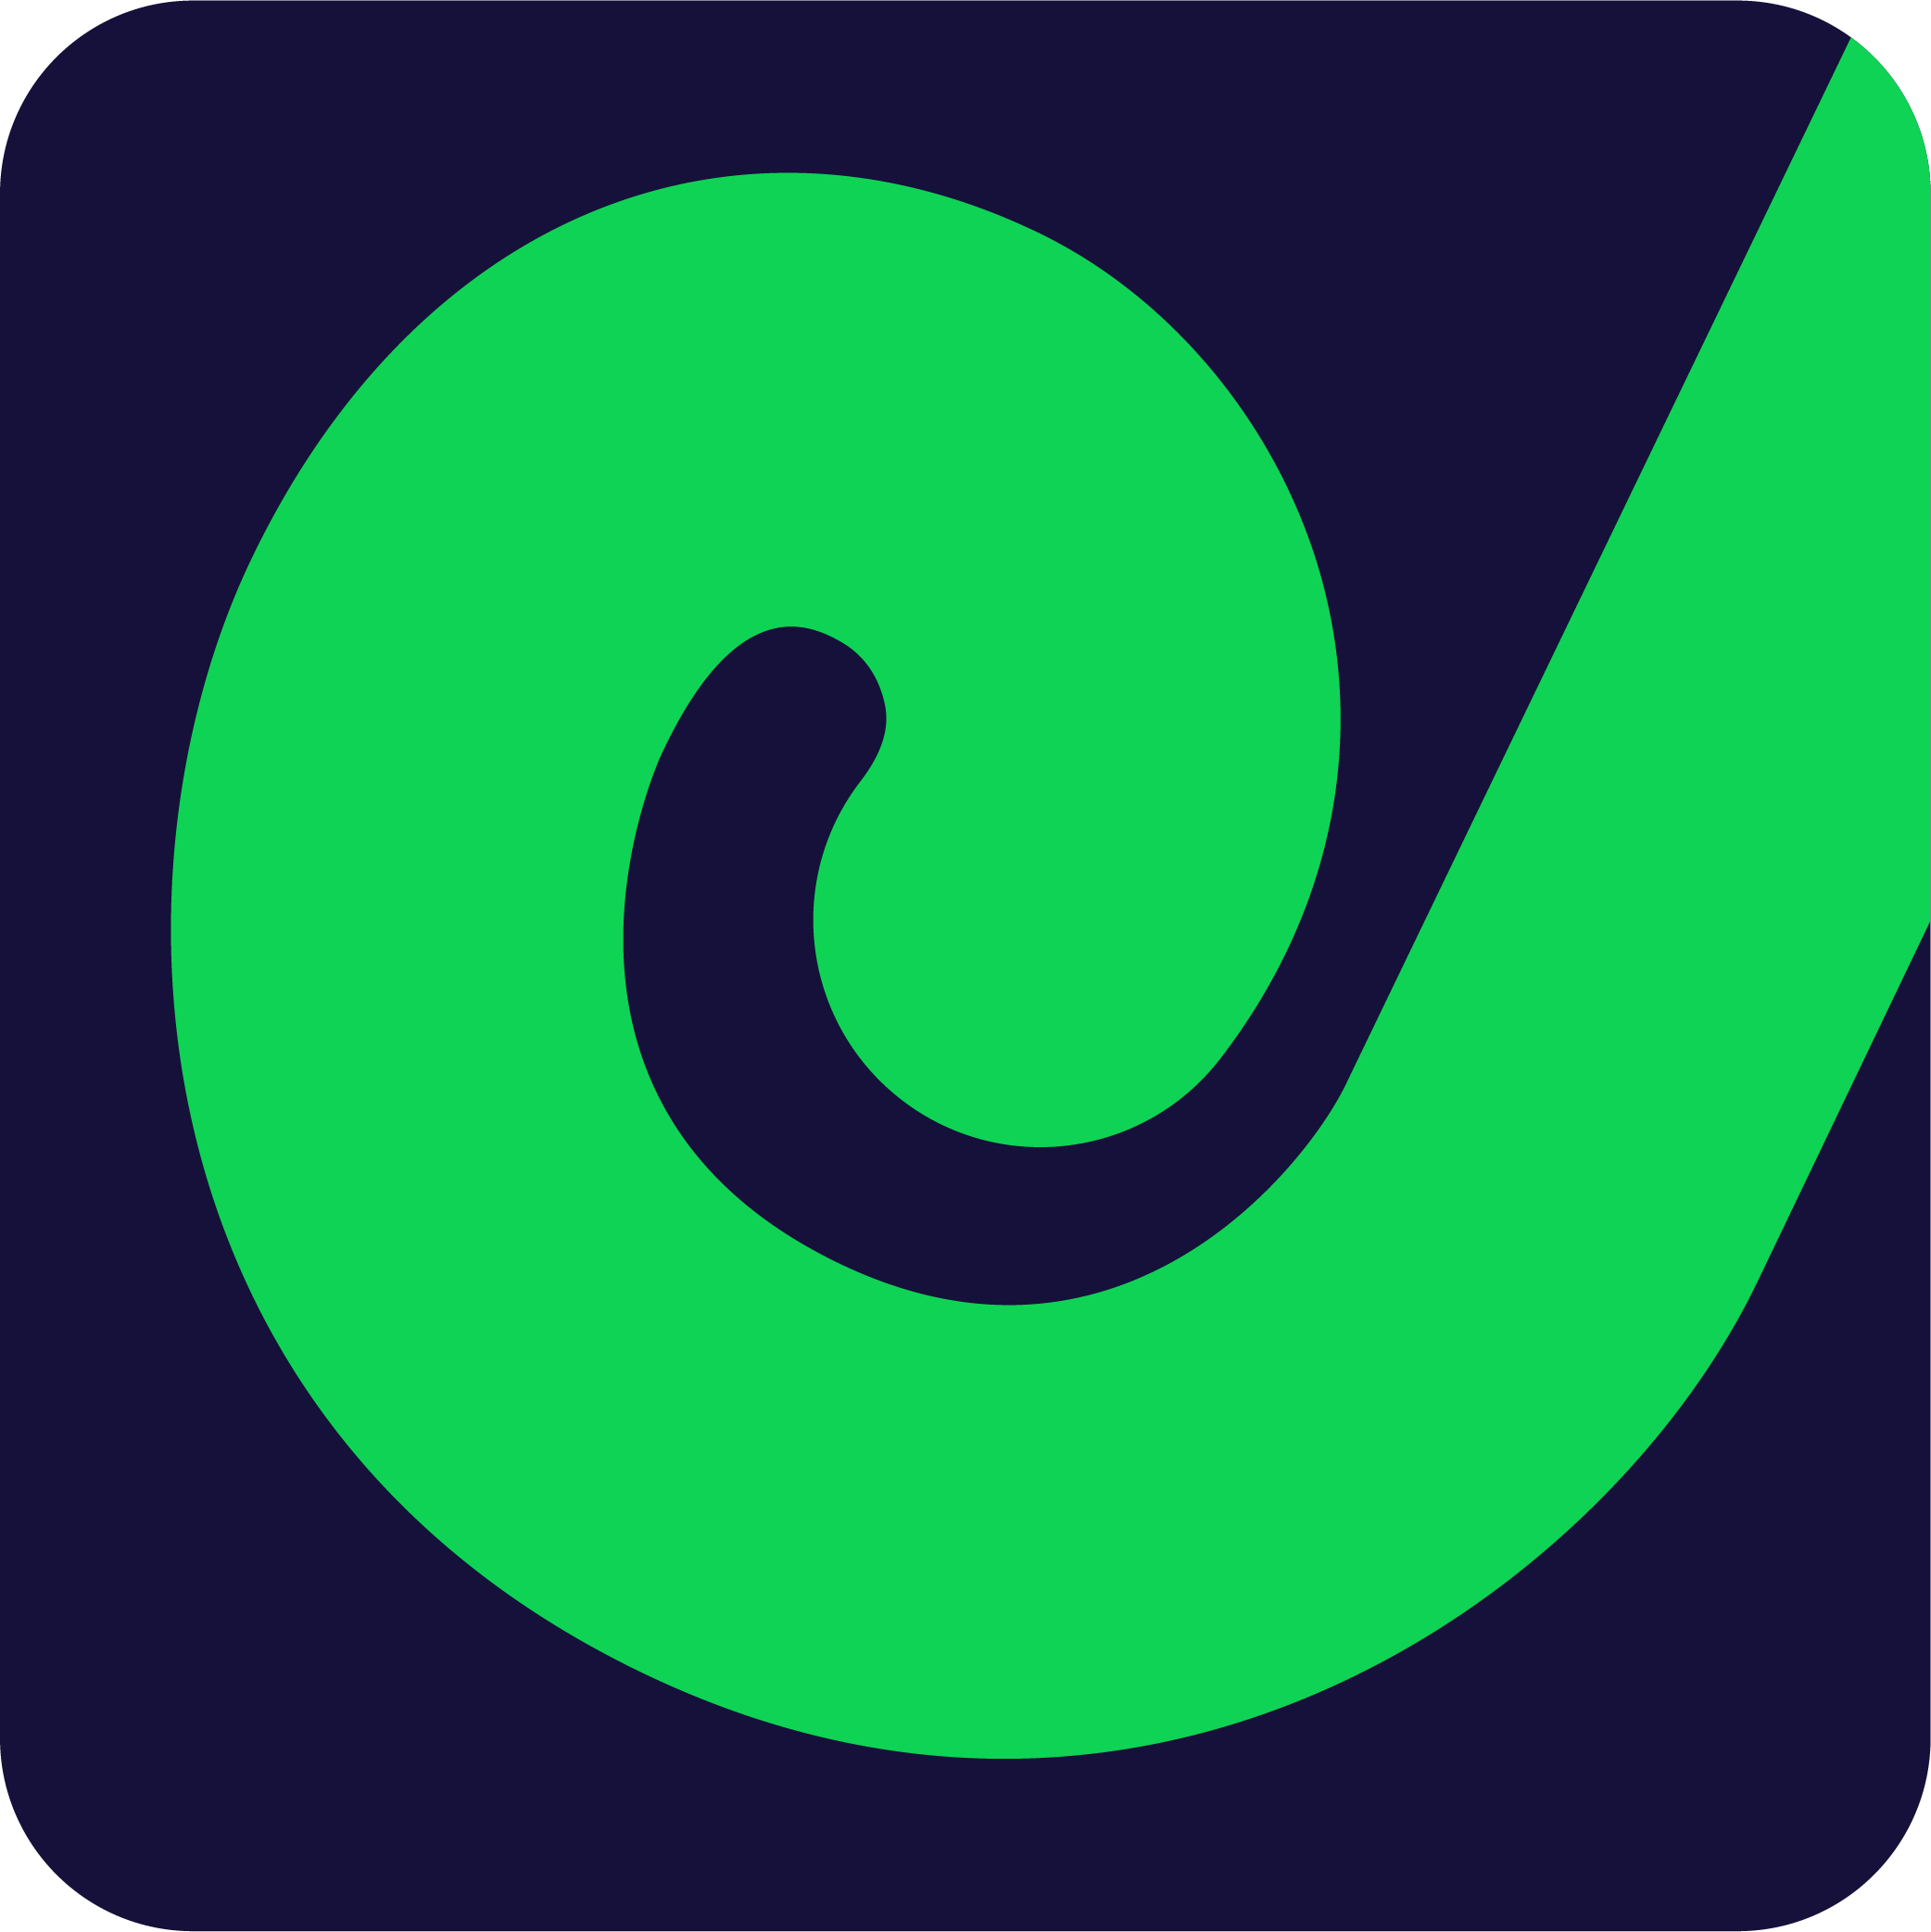 Logo Geckoboard